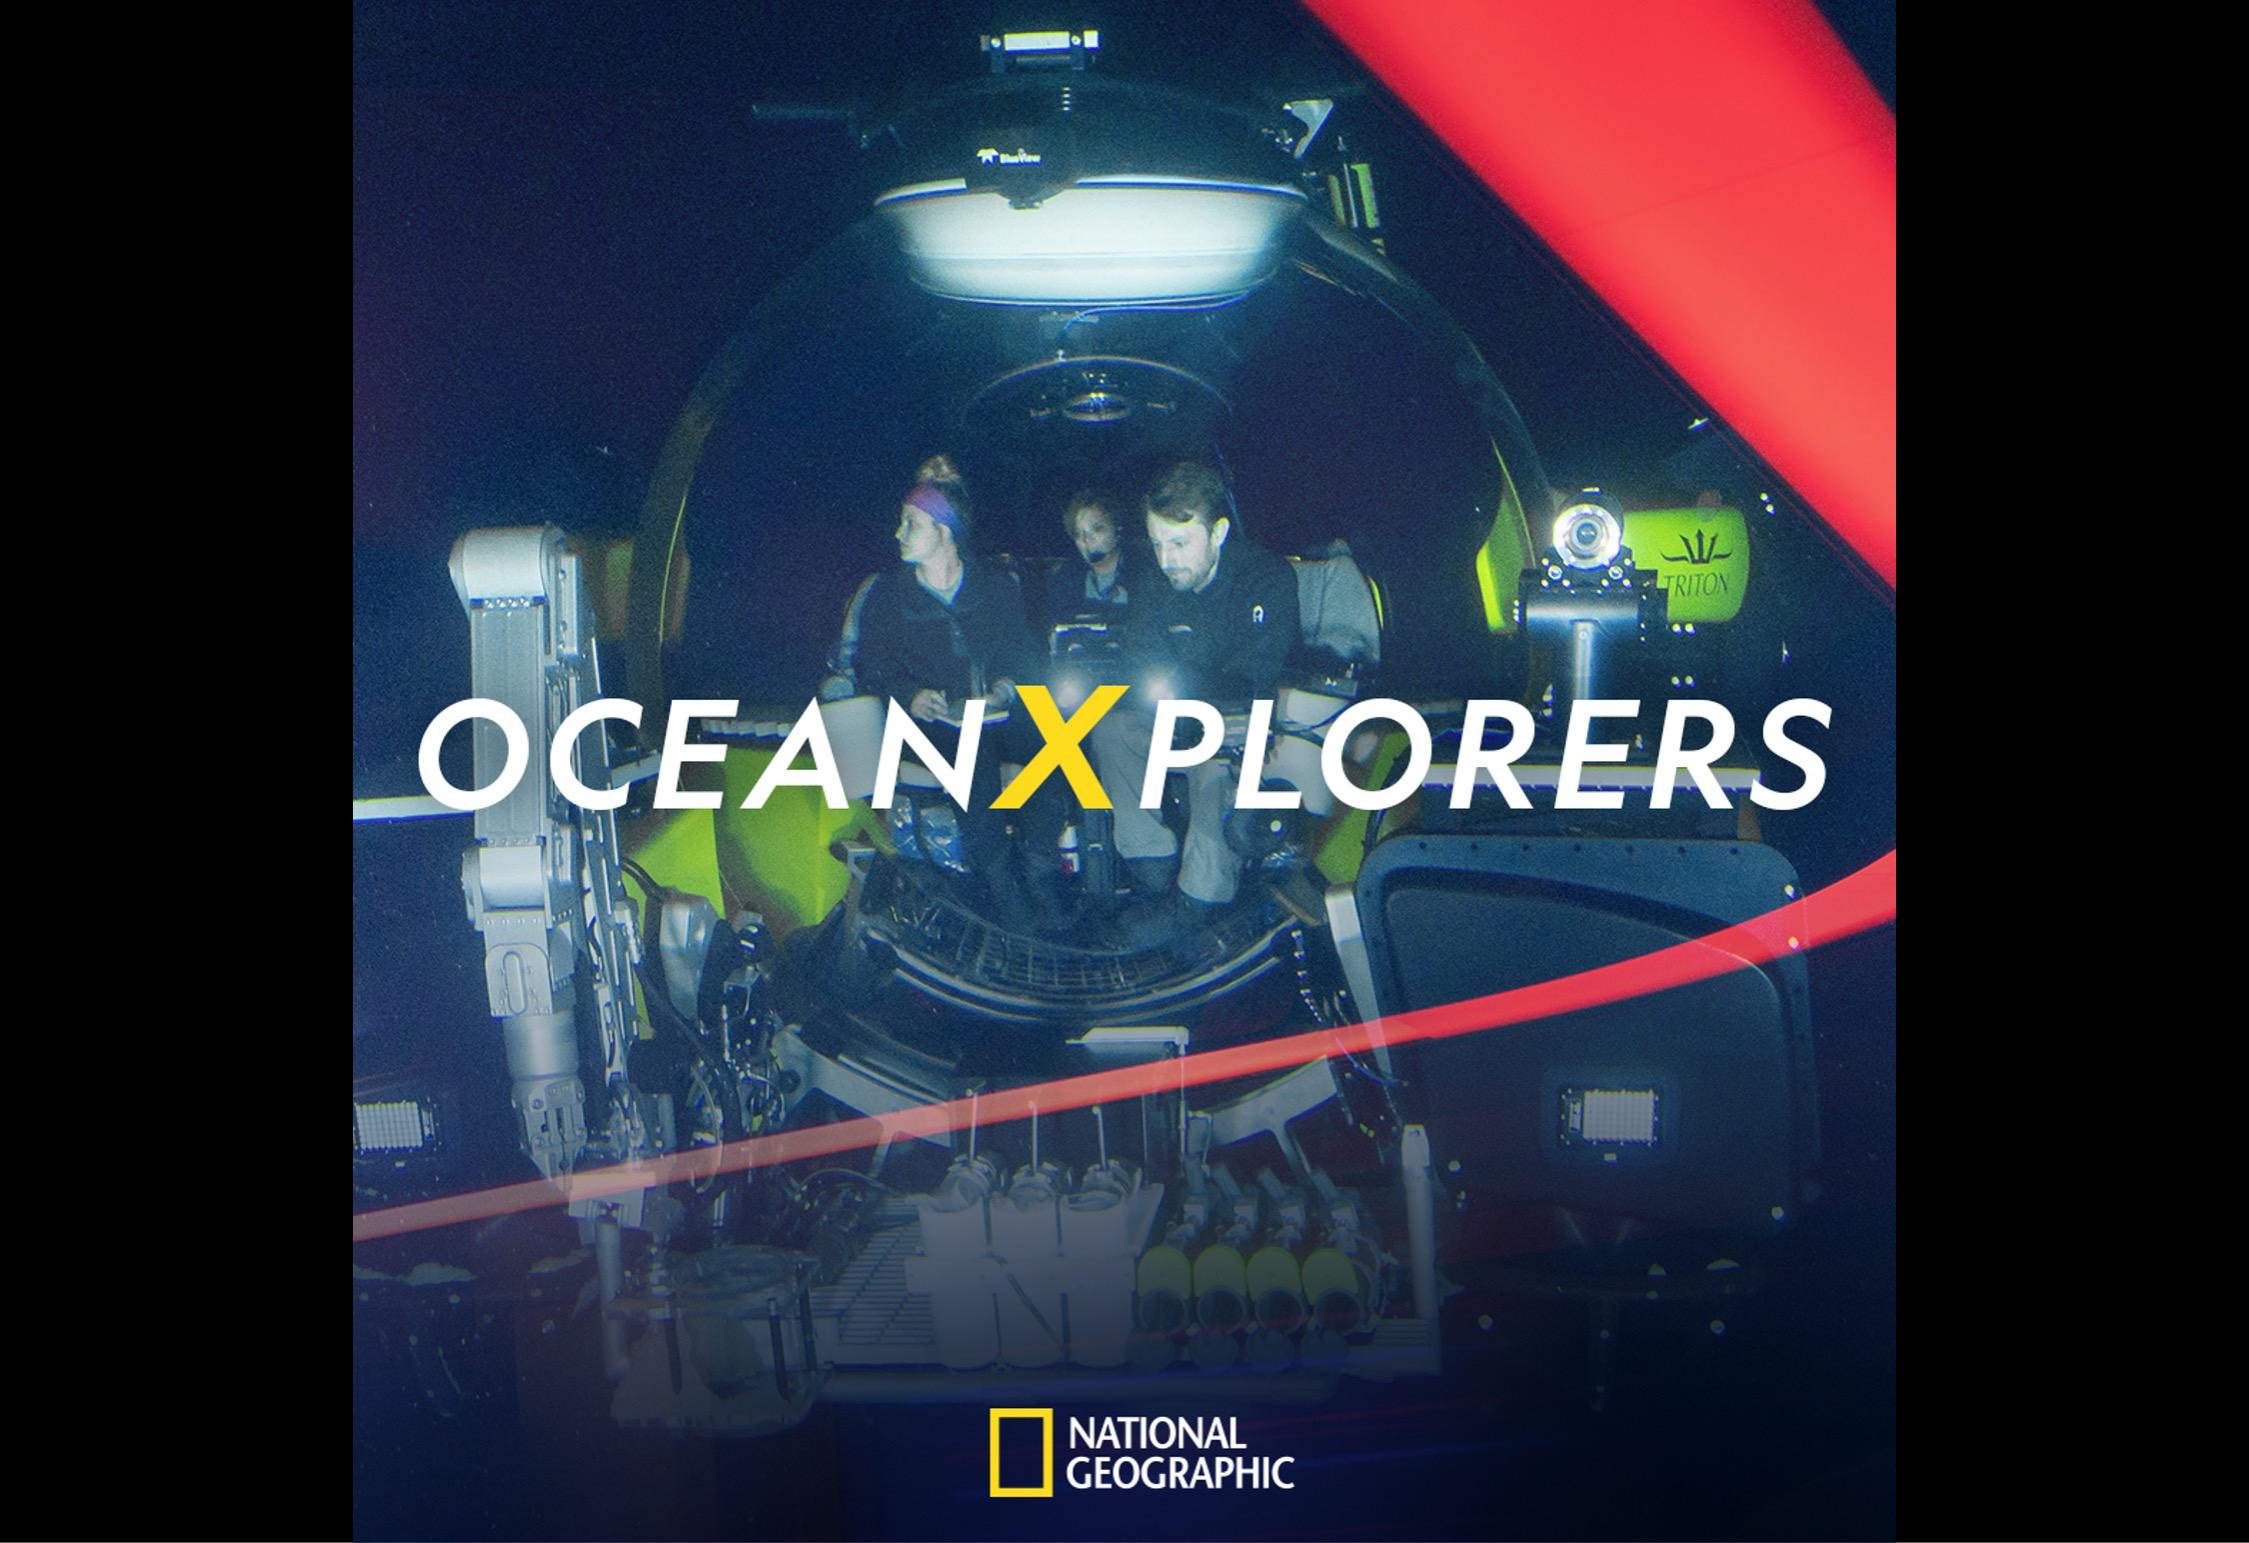 National Geographic Announces Intrepid Team for Groundbreaking Ocean Exploration Series, 'OceanXplorers'